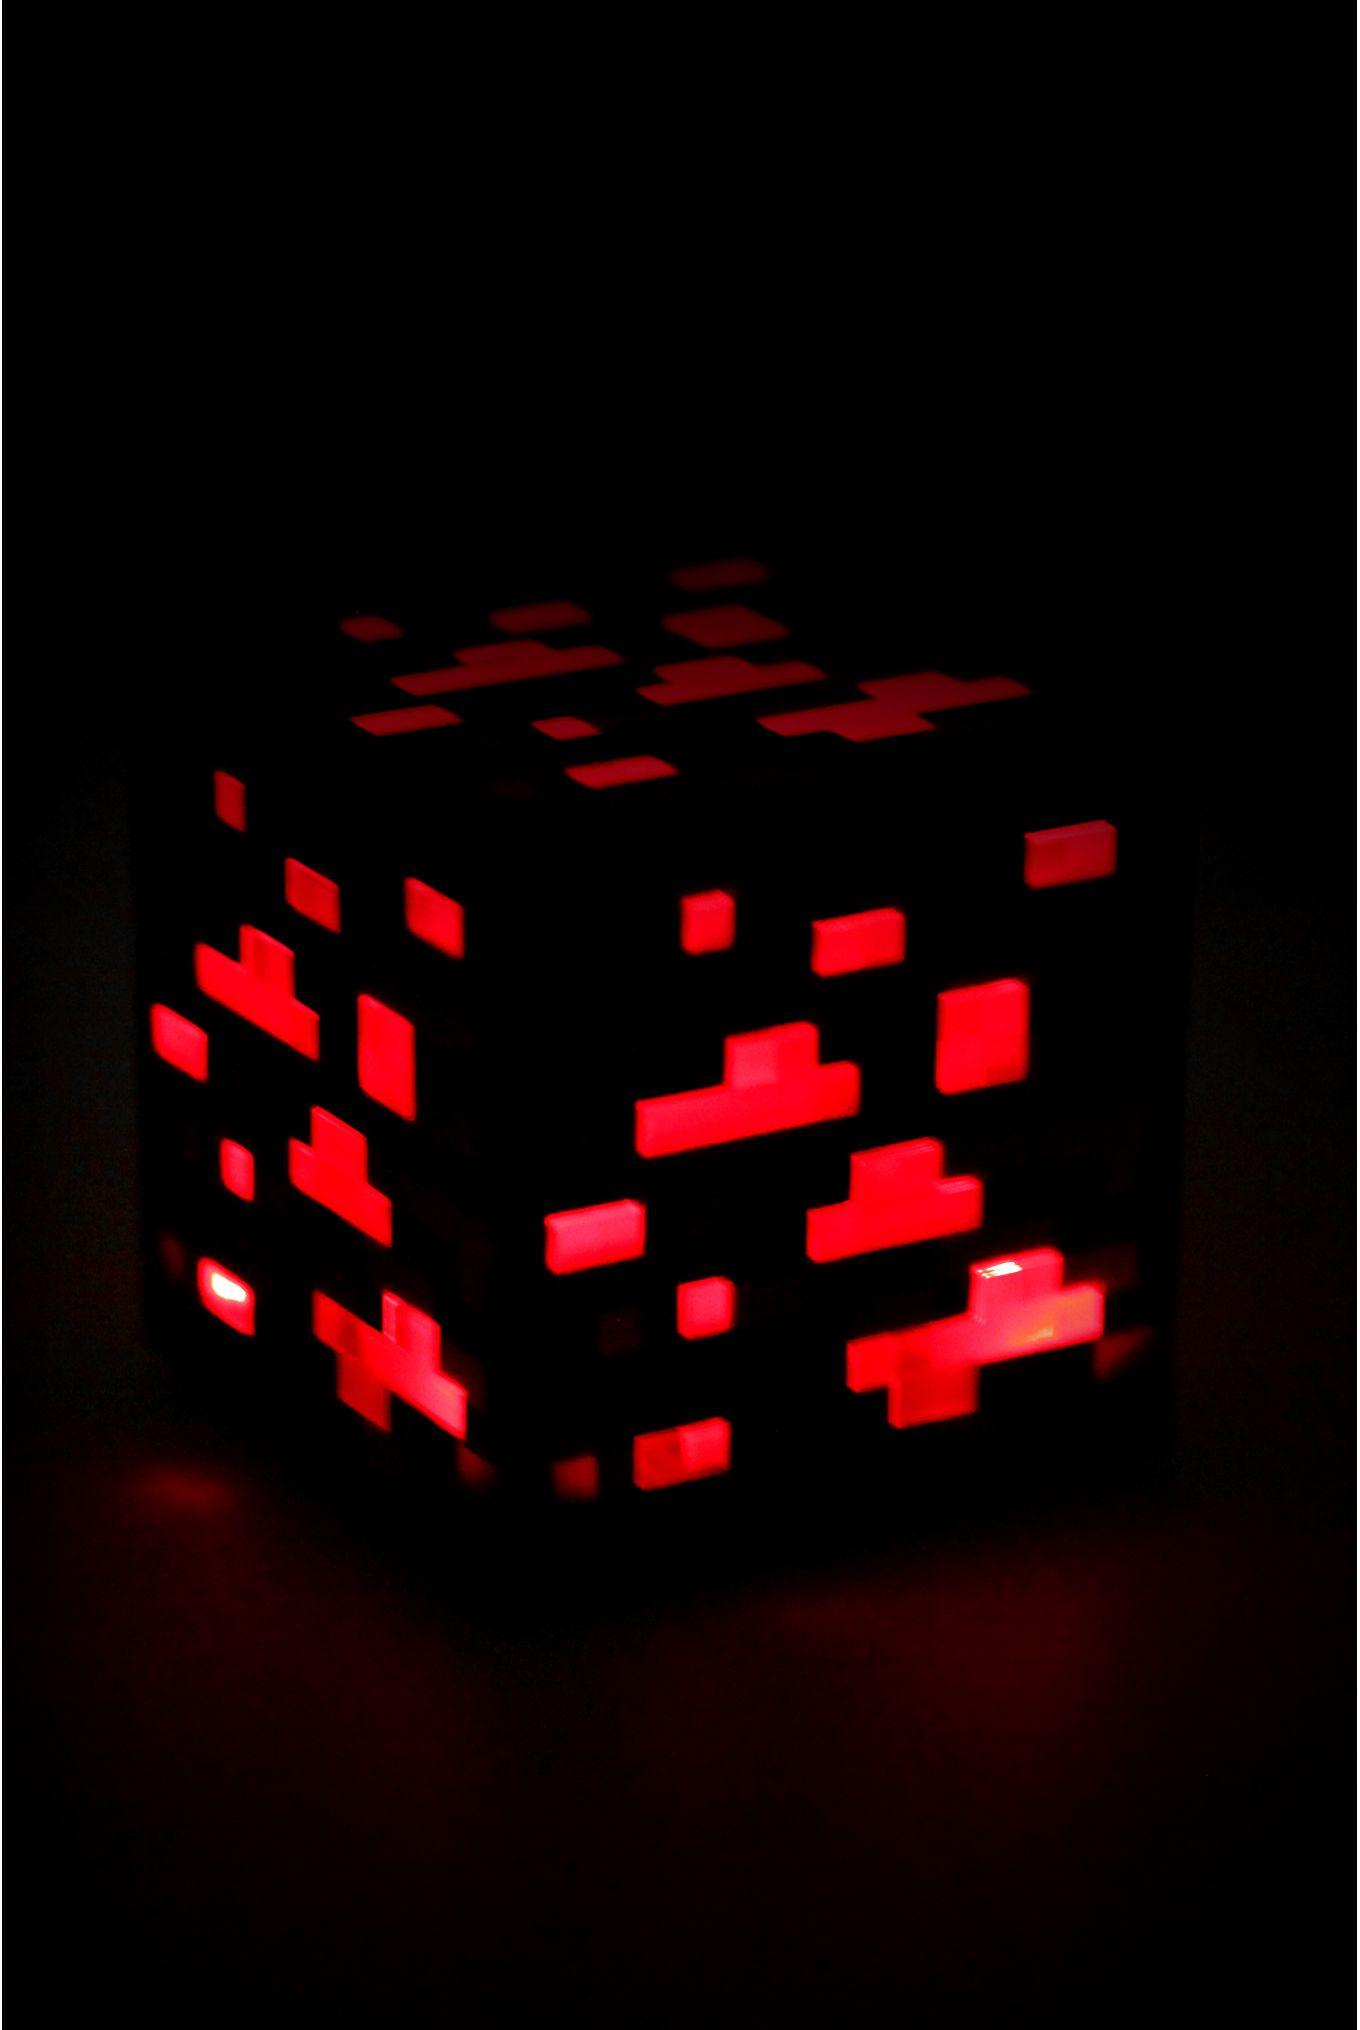 Hot topic redstone light up minecraft block Minecraft